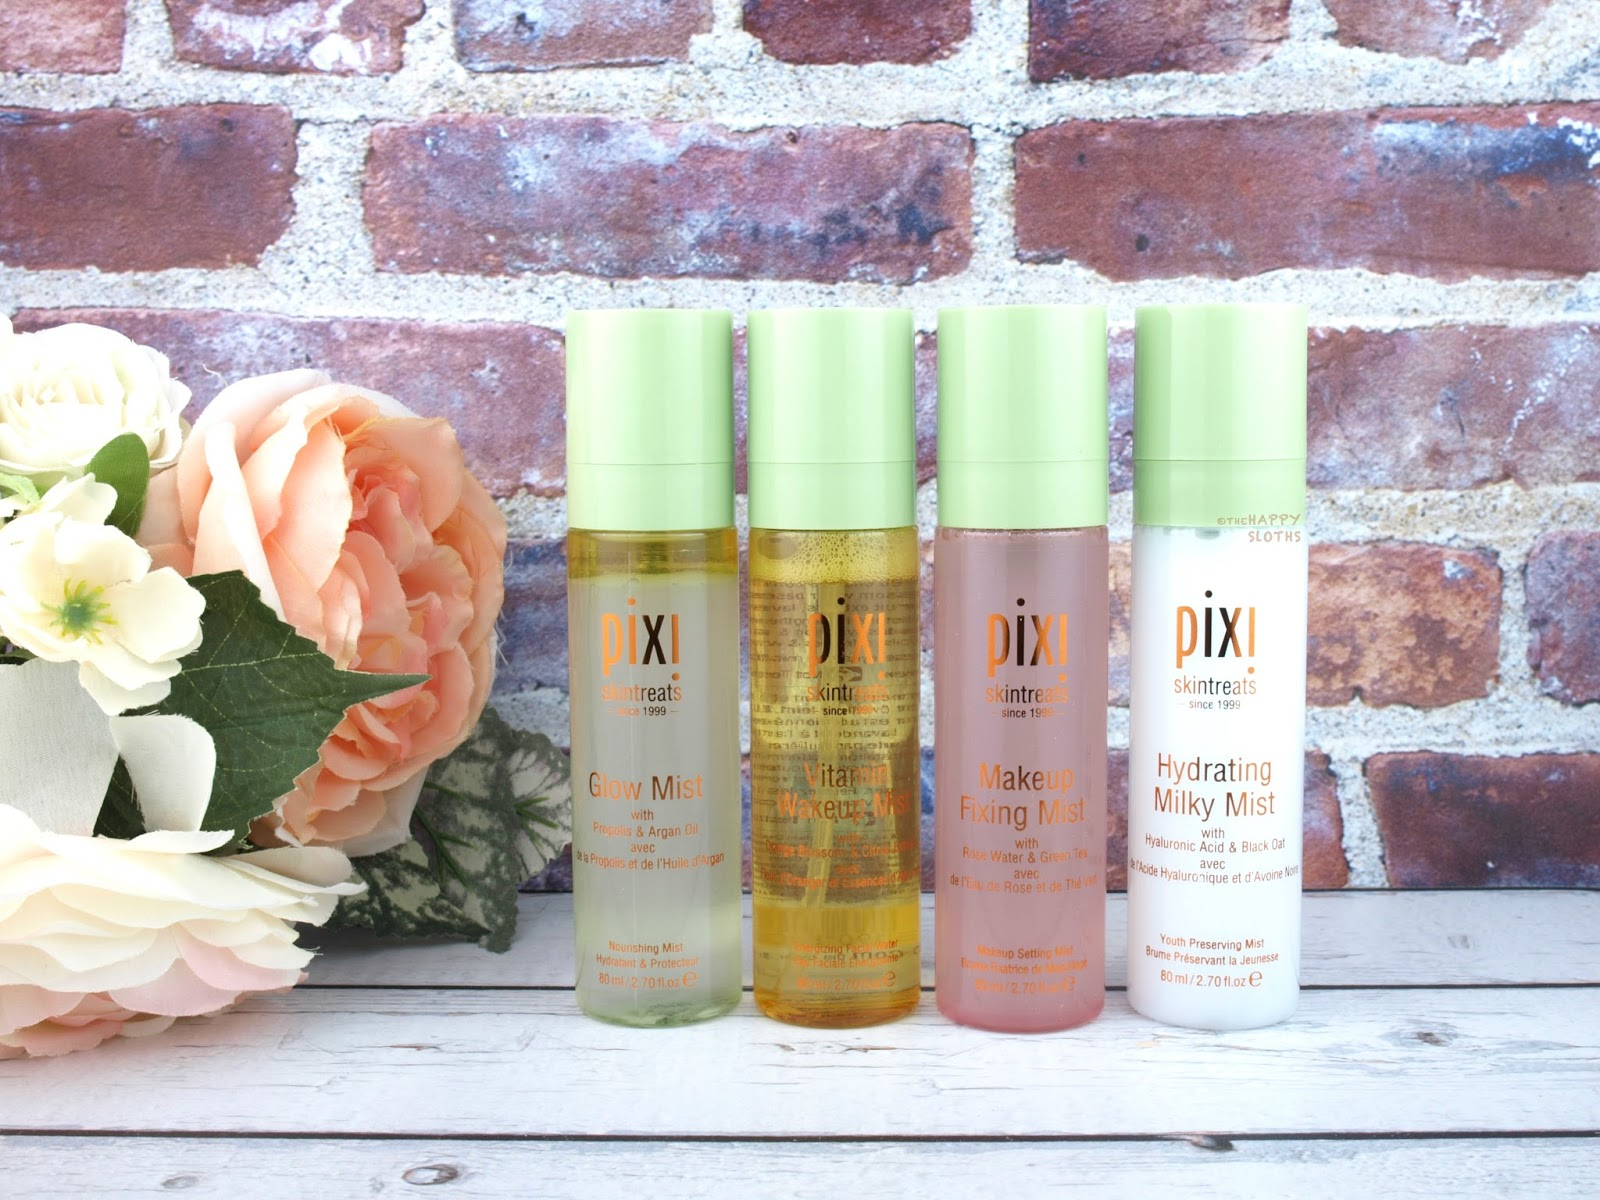 Pixi Skintreats | Hydrating Milky Mist, Makeup Fixing Mist, Vitamin Wakeup Mist & Glow Mist: Review